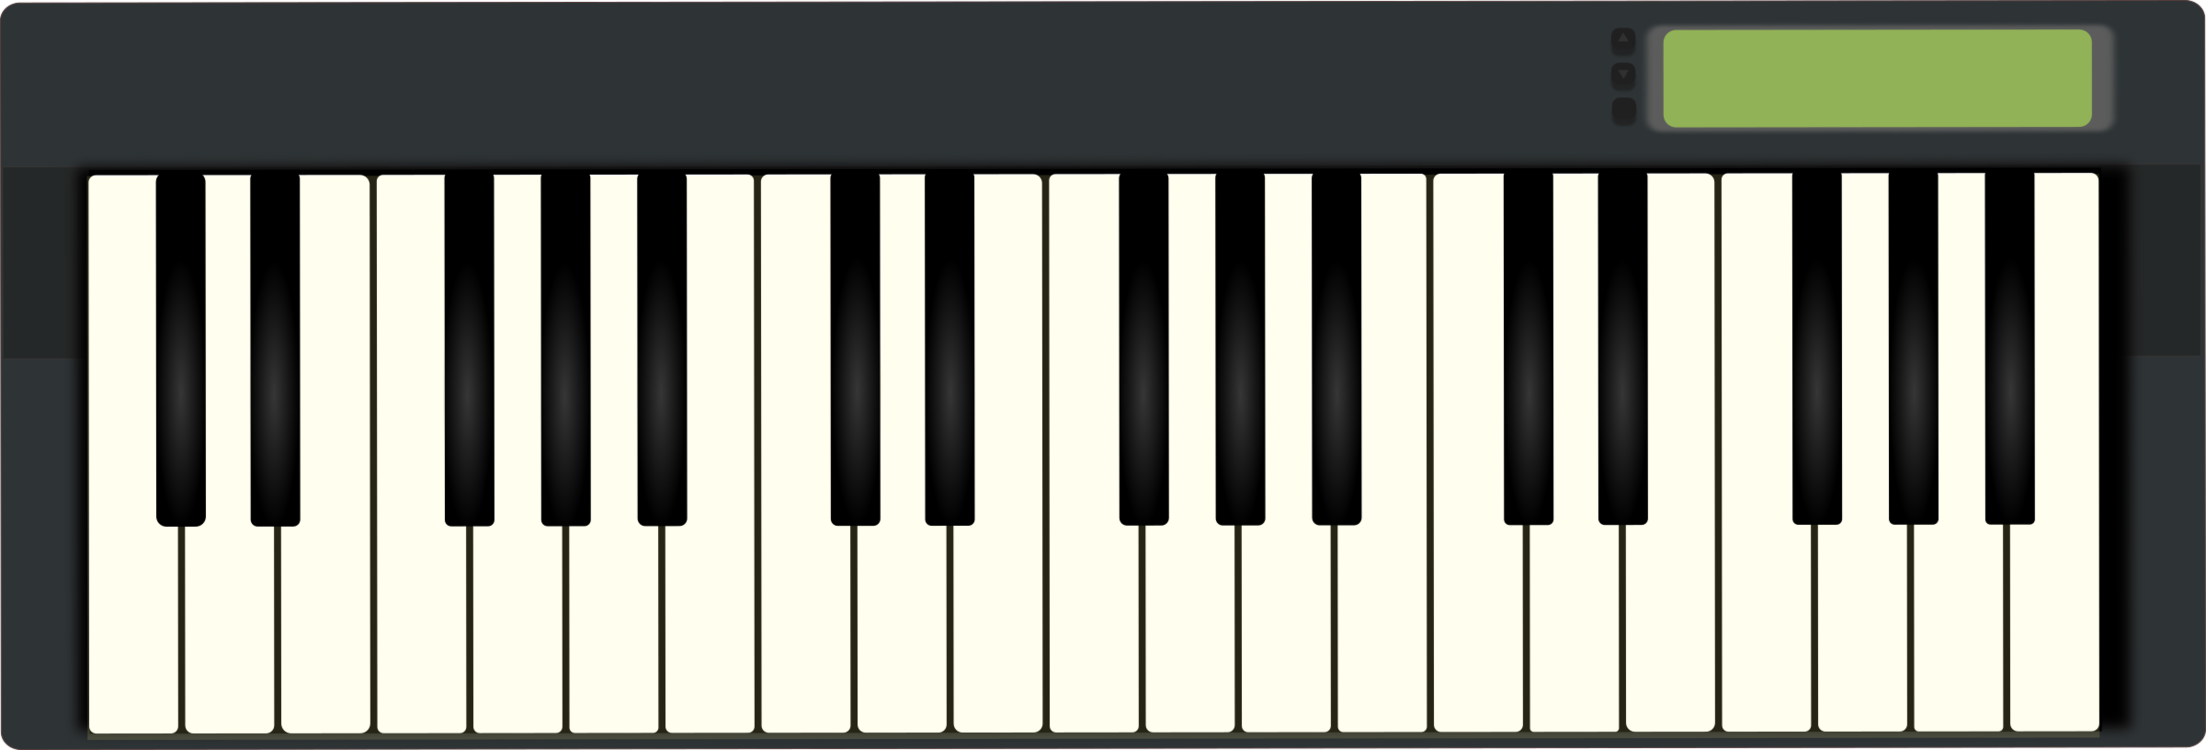 Midi controller clipart clip freeuse library Digital Piano,Musical Instrument,Electric Piano Clipart ... clip freeuse library